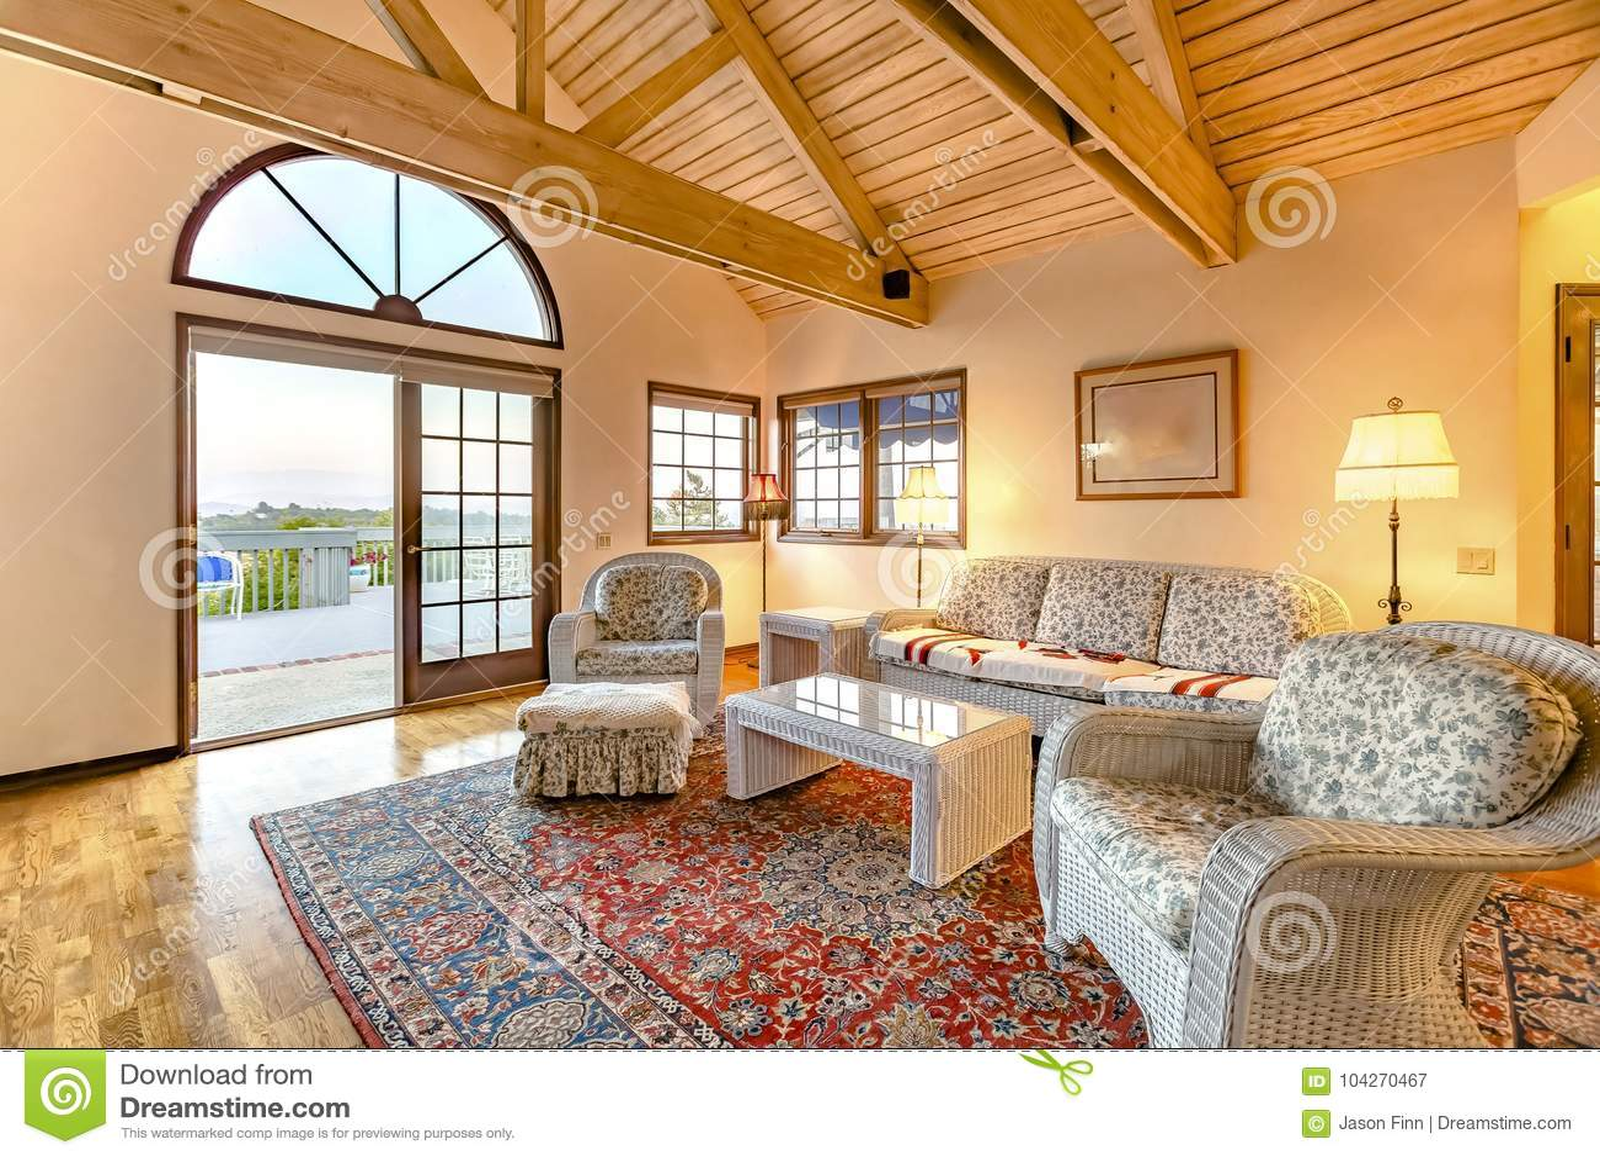 Hout In Woonkamer : ≥ complete woonkamer delige set kasten tafels beuken hout